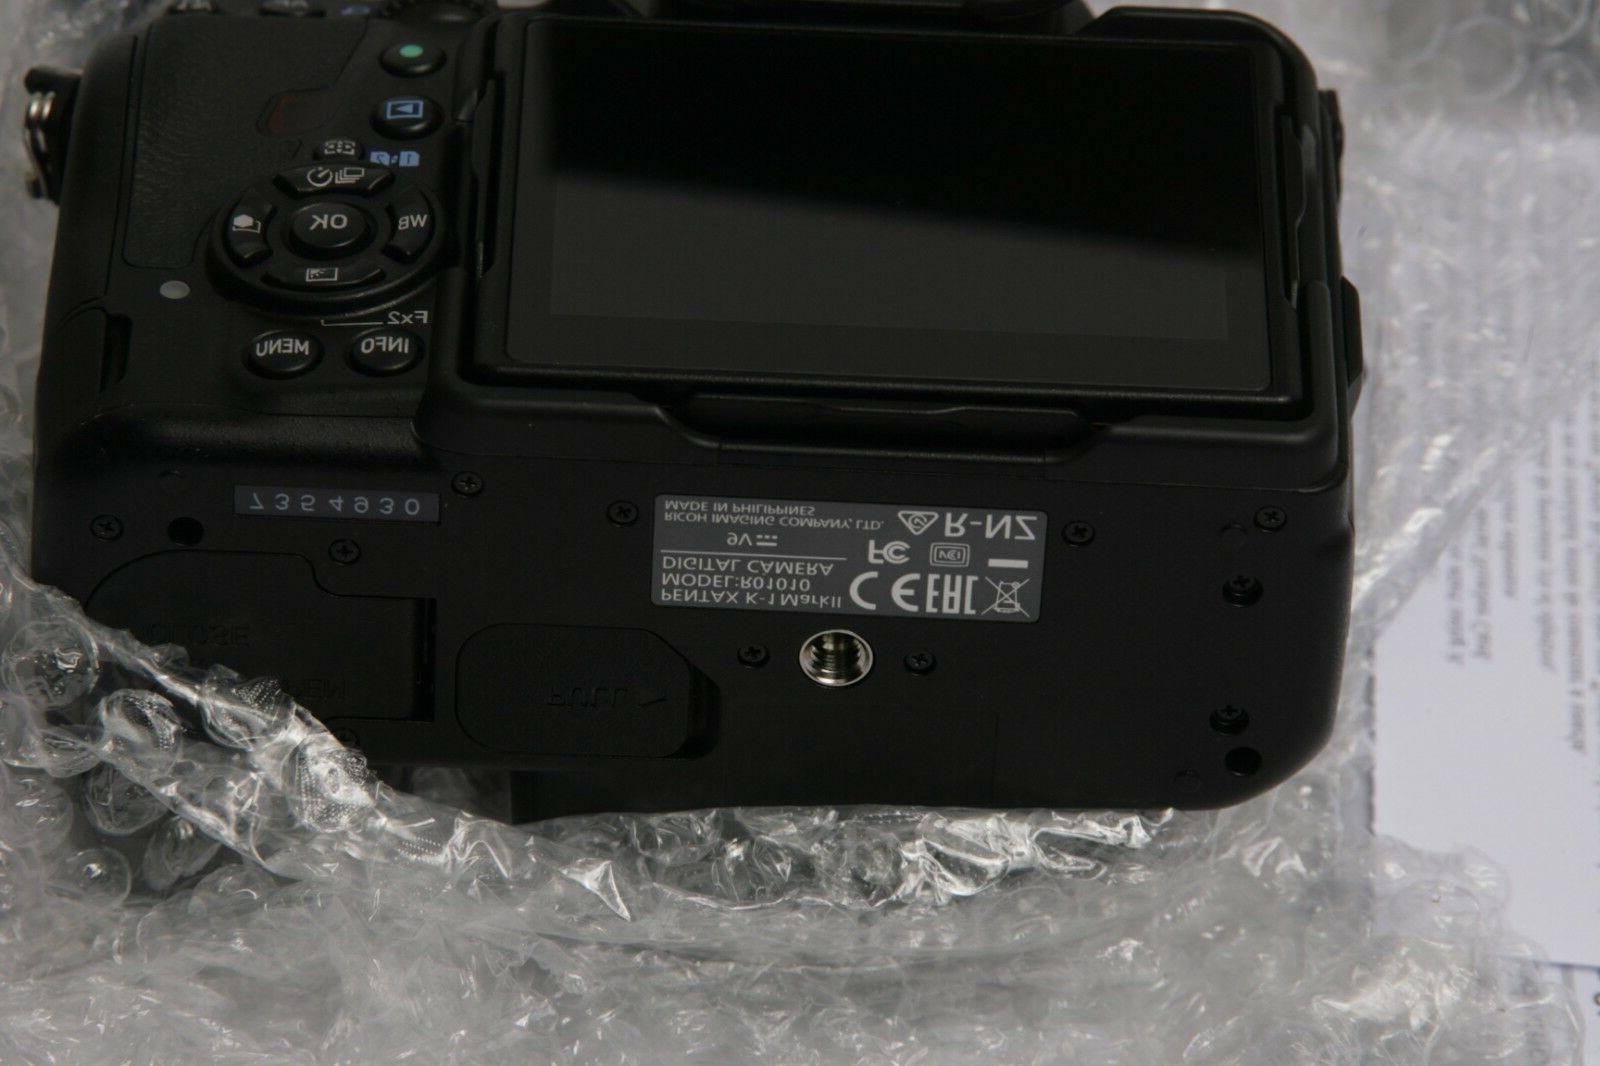 PENTAX K-1 Mark 36.4 MP -